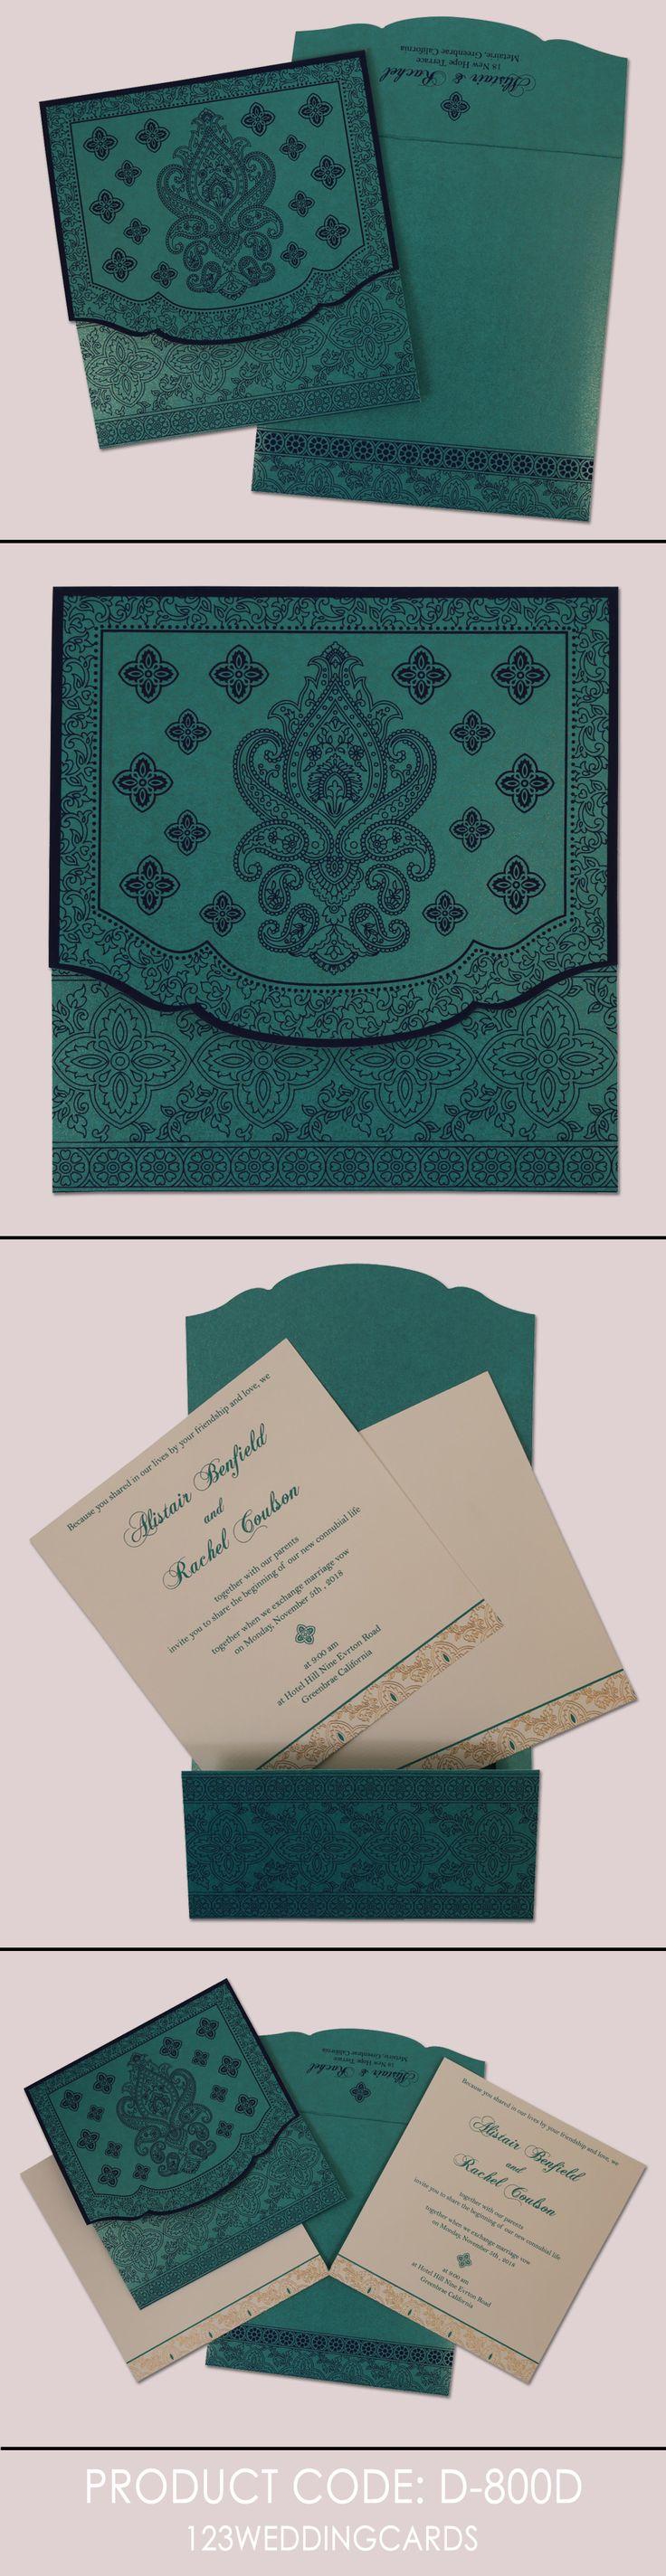 BLUE SHIMMERY SCREEN PRINTED WEDDING INVITATION